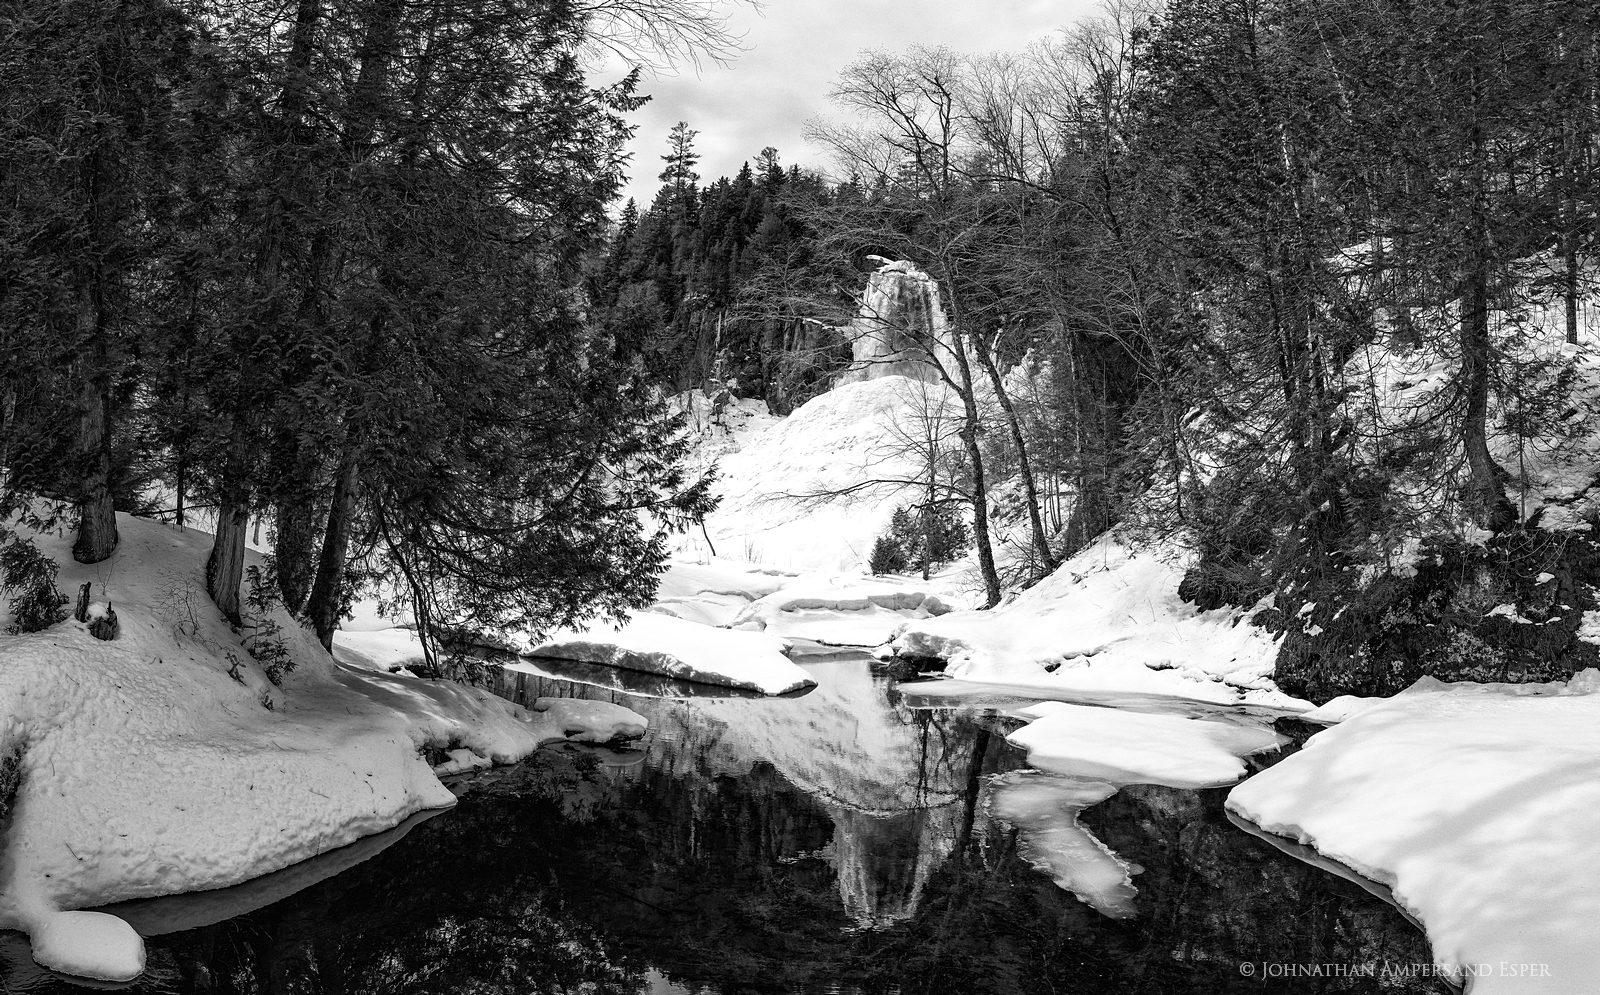 black and white,OK Slip Falls,OK Slip,Ok Slip falls,reflection,canyon,Hudson River Gorge,spring,April,2017, photo